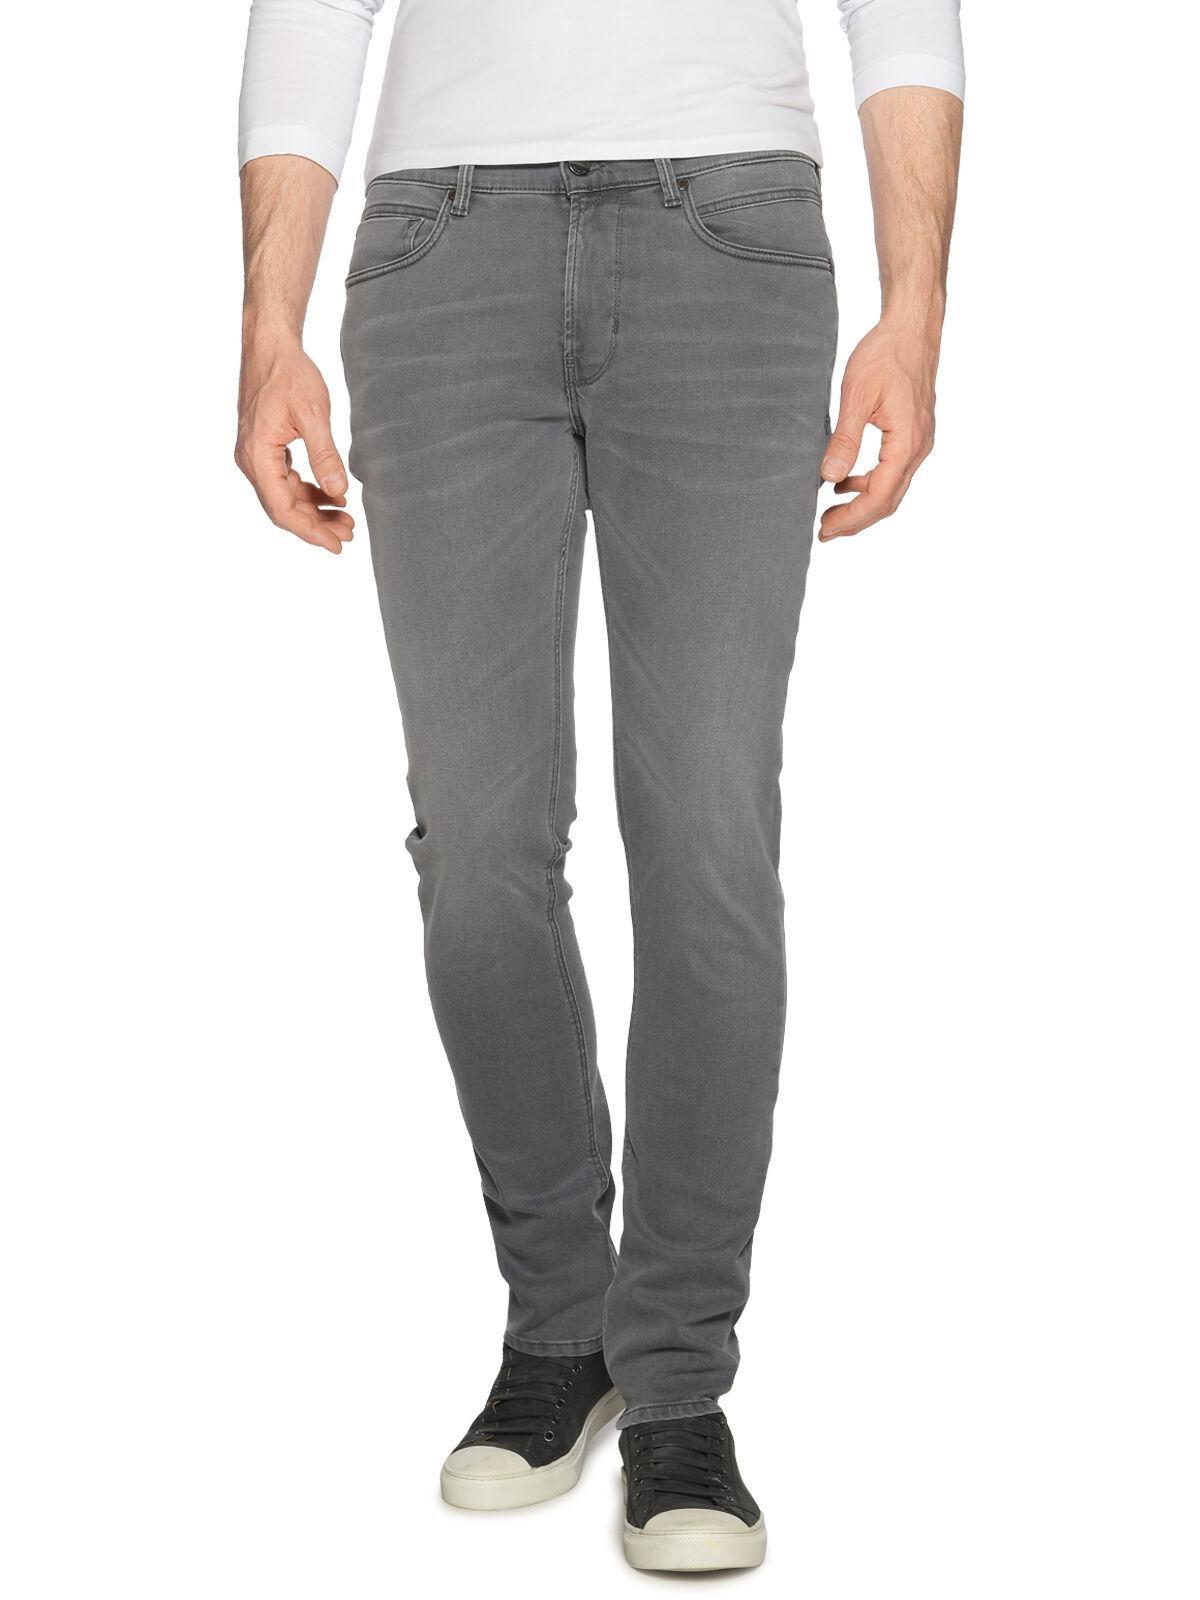 Vidar Jeans